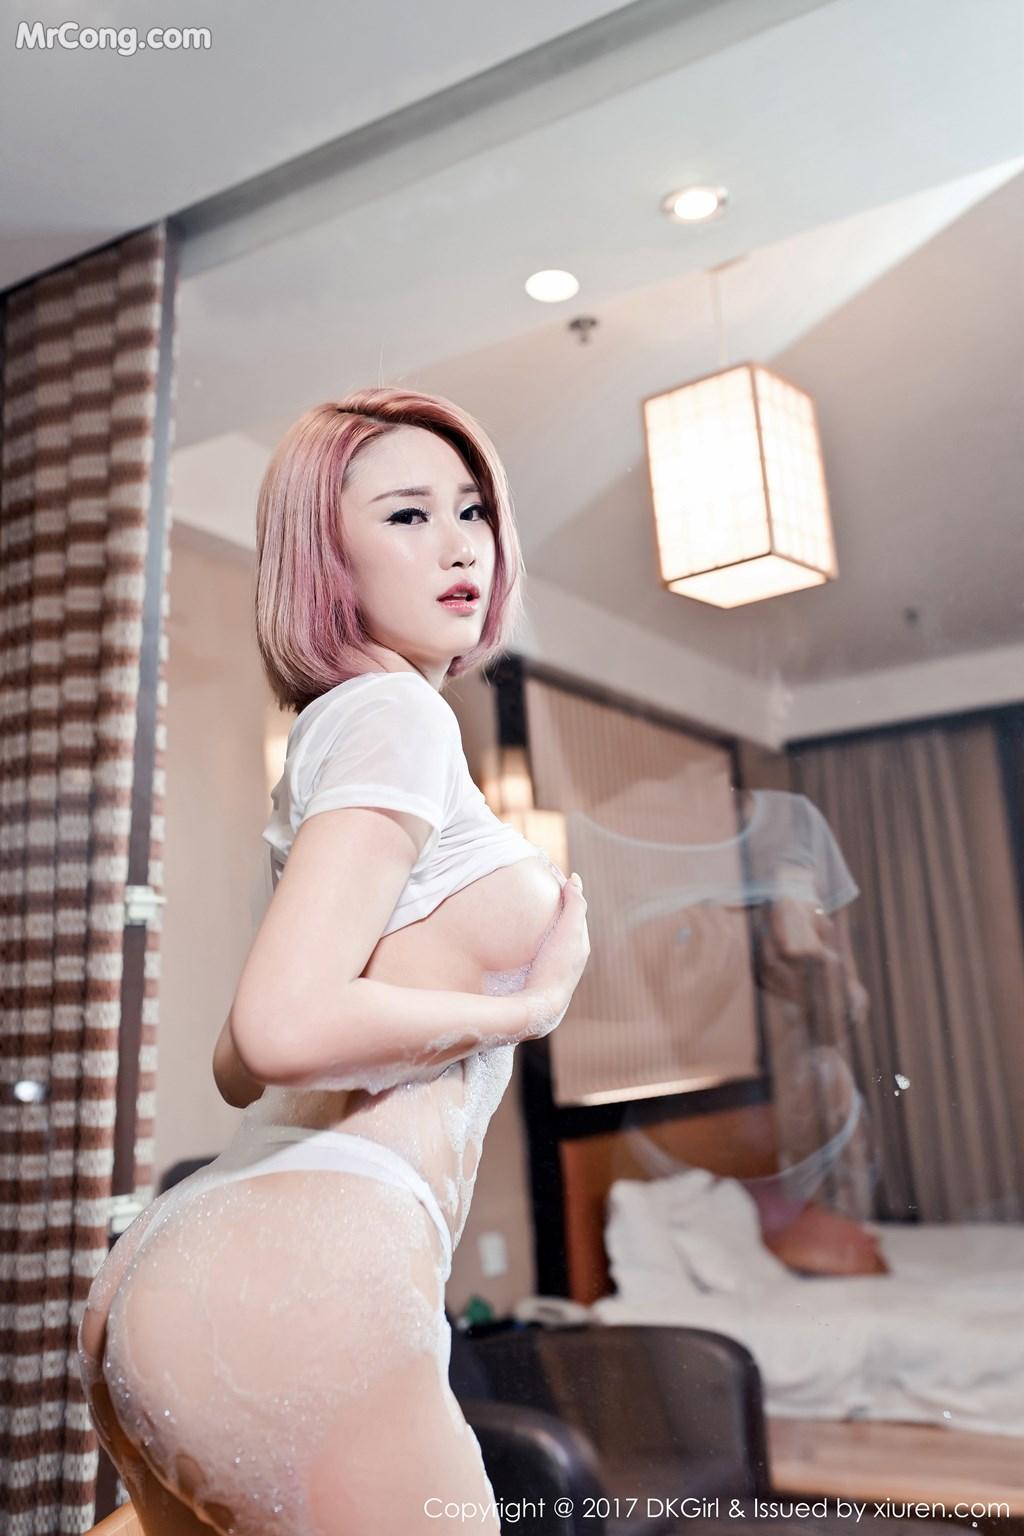 Image DKGirl-Vol.045-Meng-Bao-Er-BoA-MrCong.com-050 in post DKGirl Vol.045: Người mẫu Meng Bao Er (萌宝儿BoA) (56 ảnh)